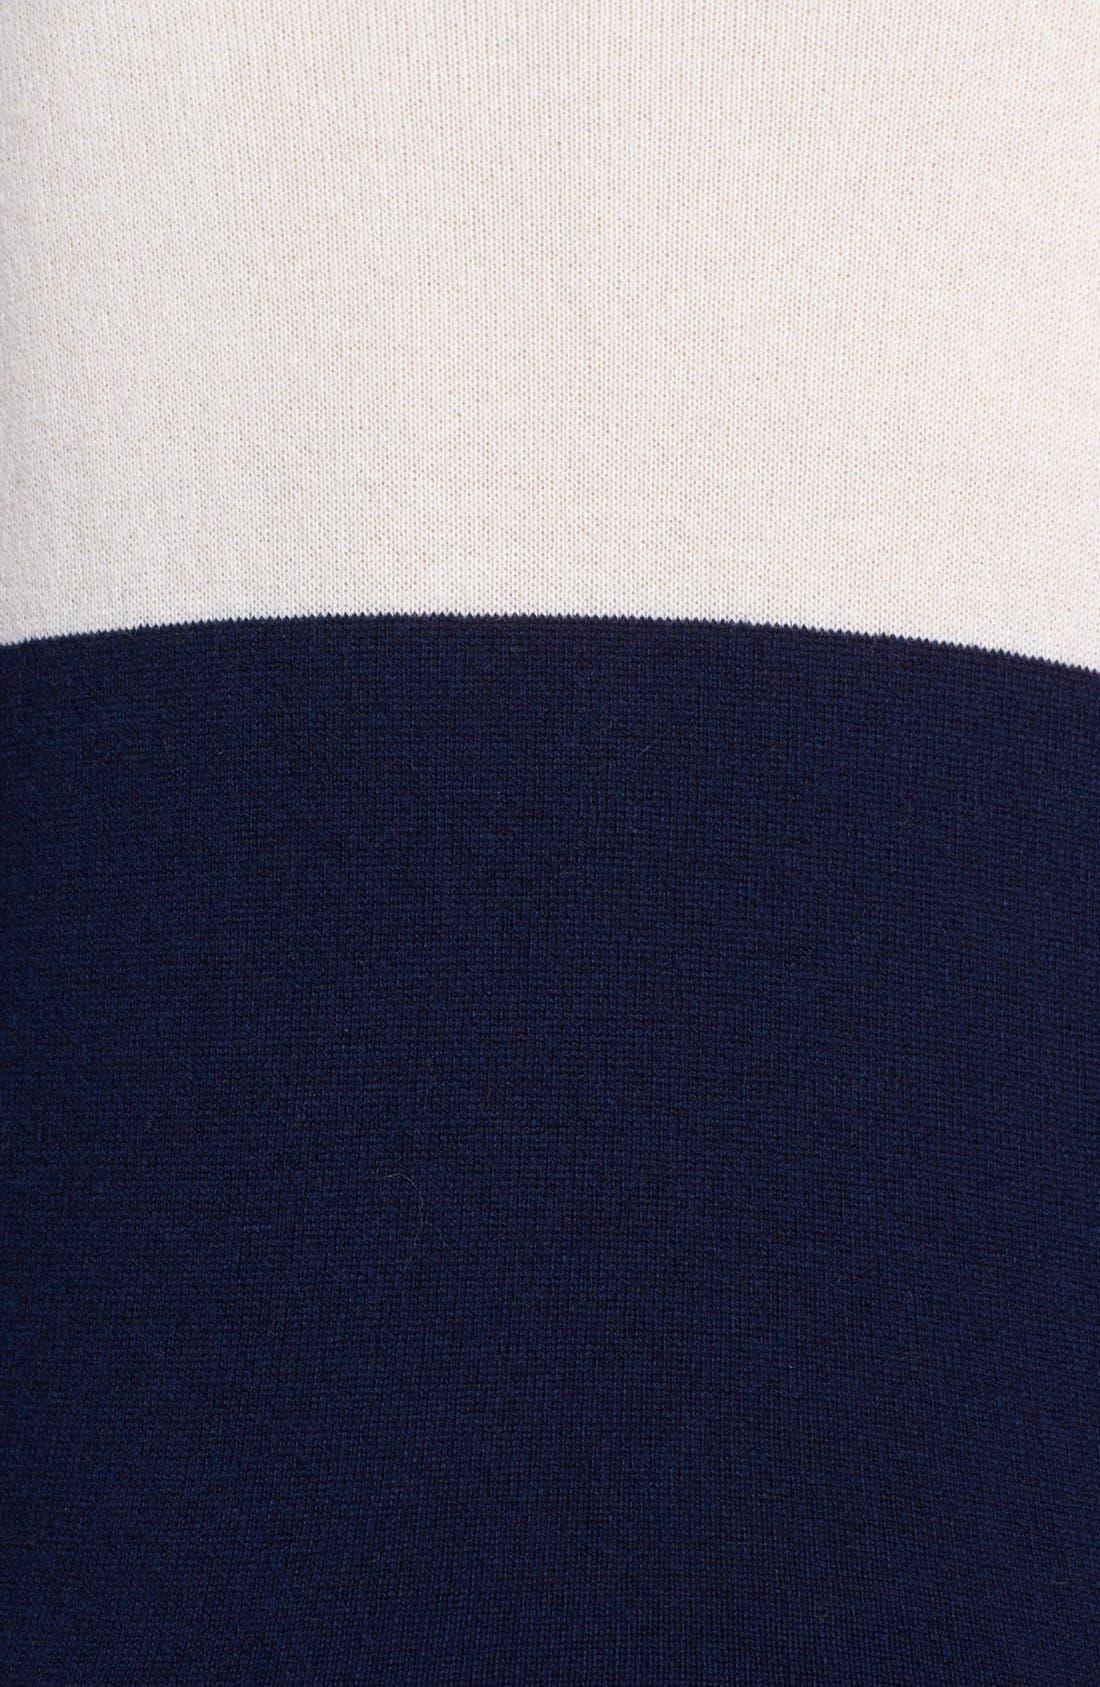 Colorblock Sweater,                             Alternate thumbnail 3, color,                             Navy/ Cream